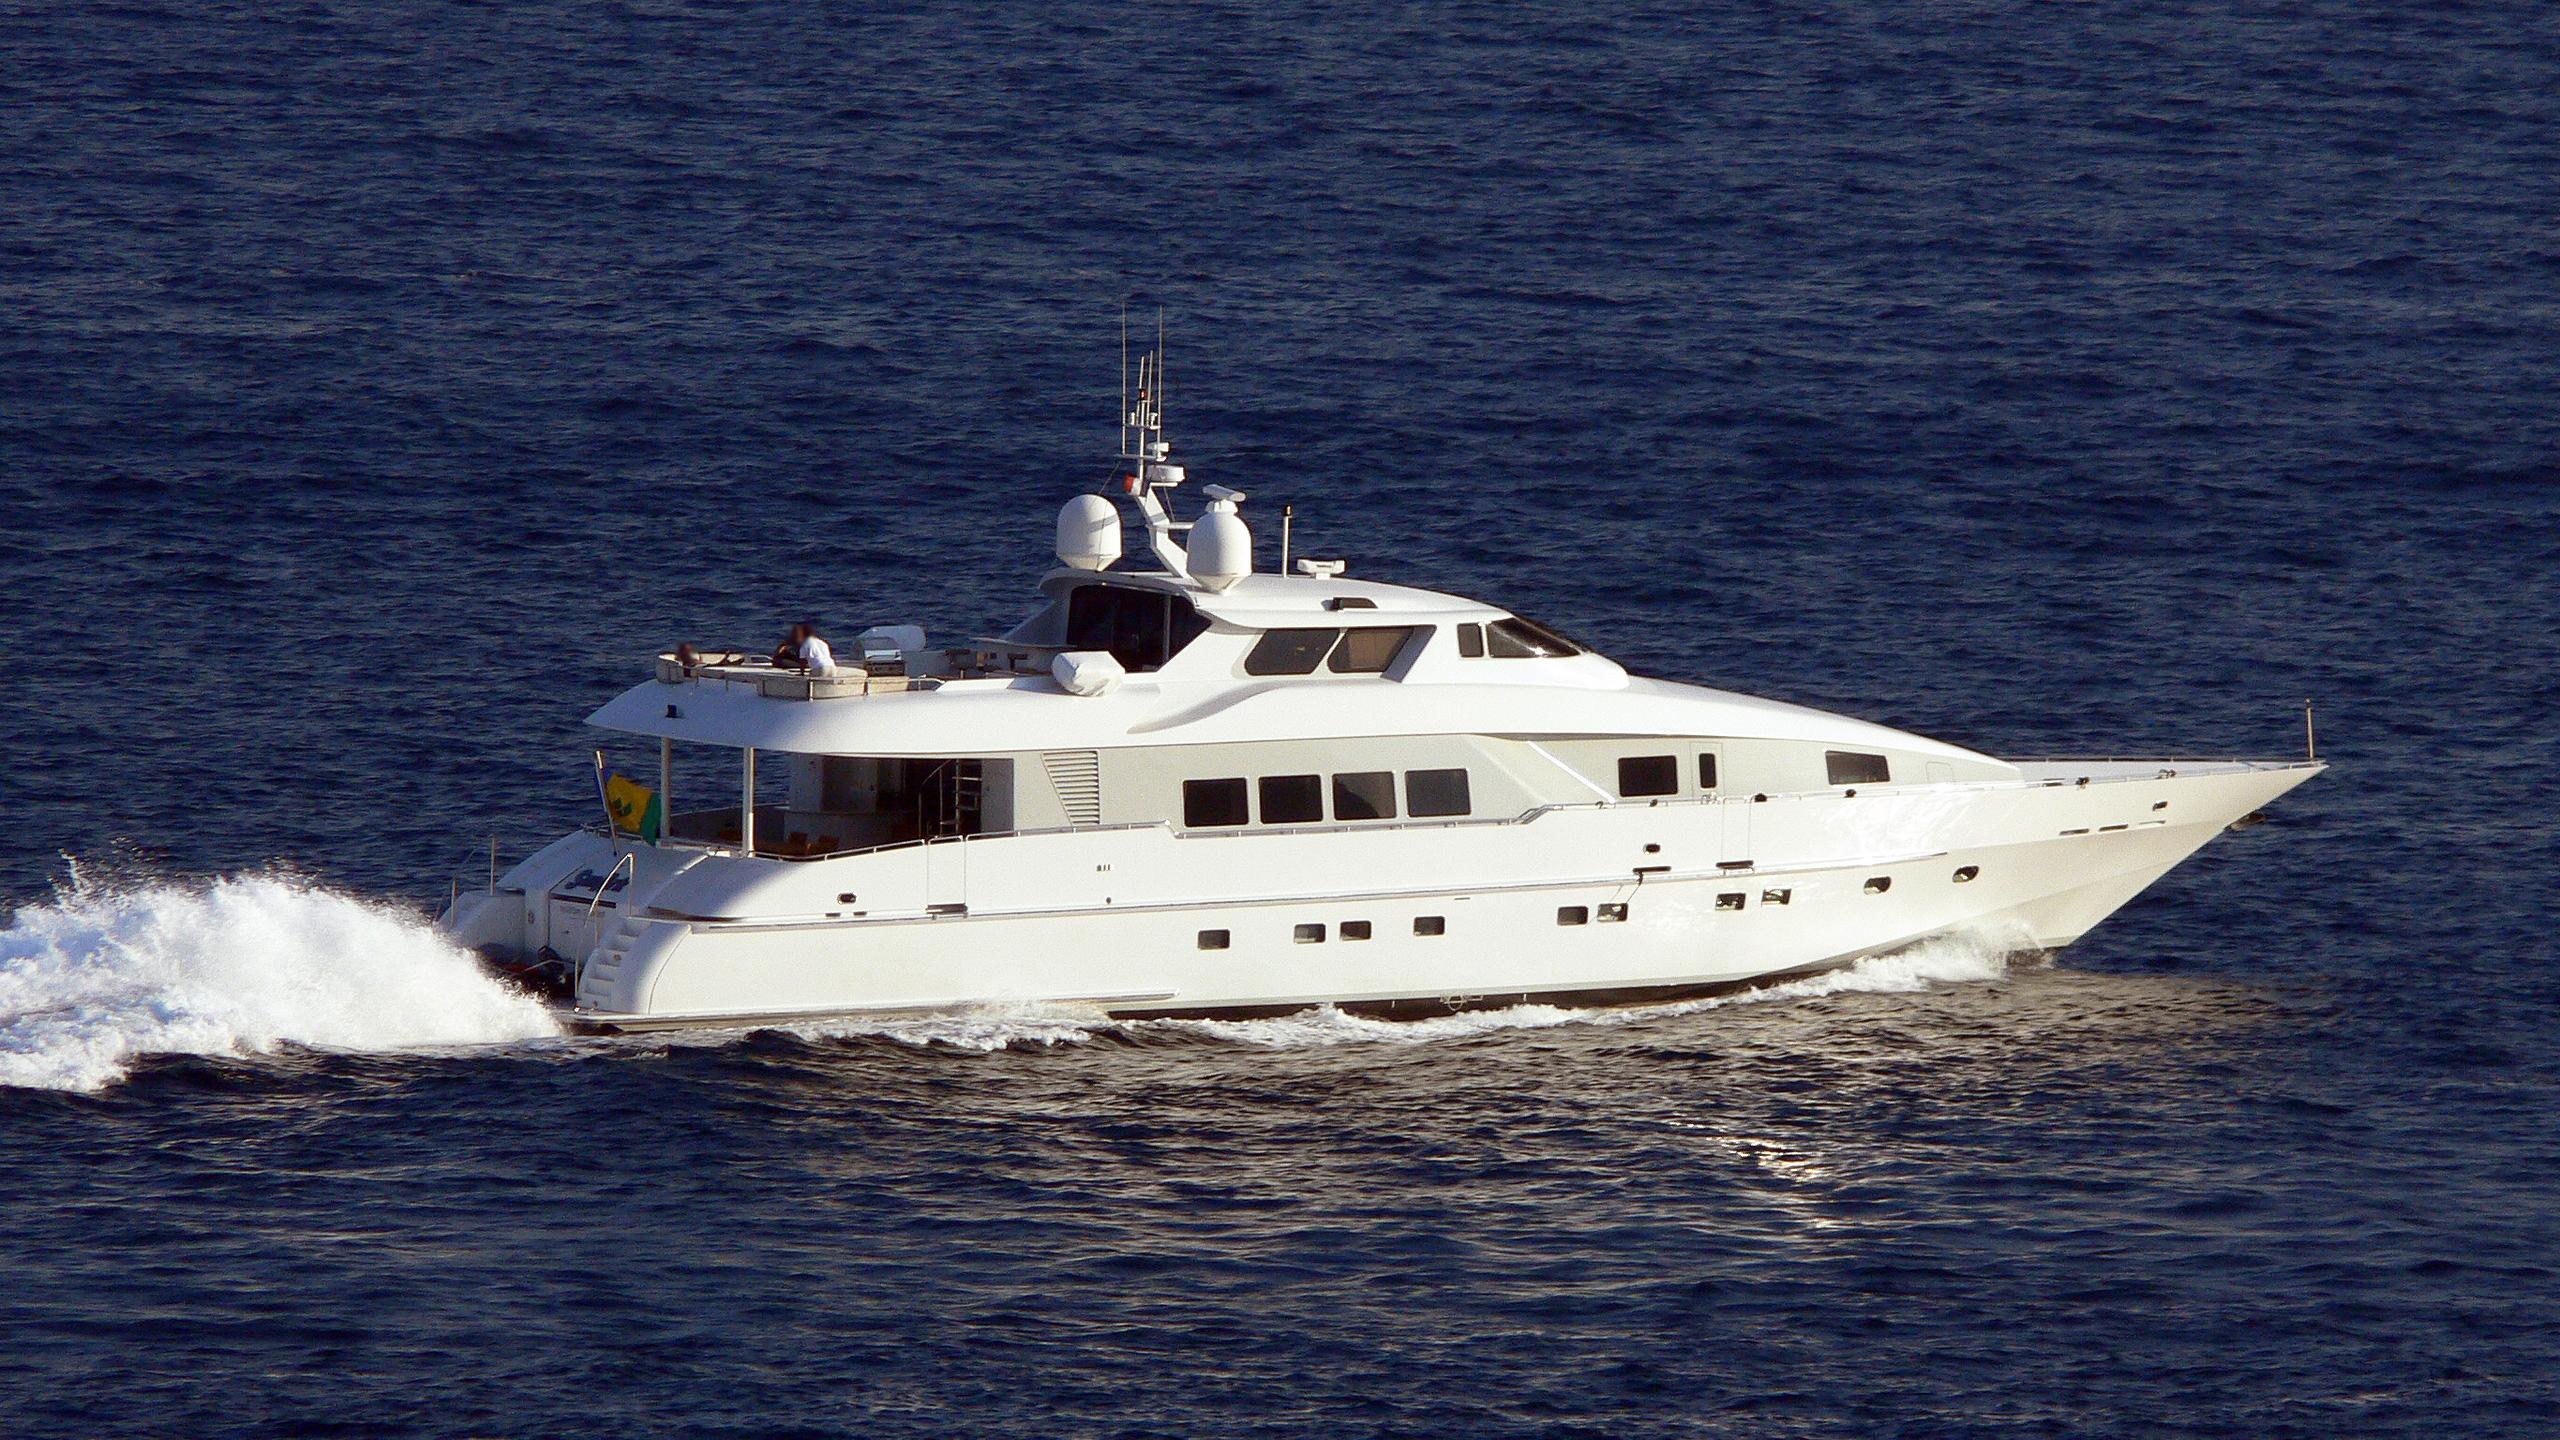 sun-ark-motor-yacht-heesen-1995-37m-cruising-half-profile